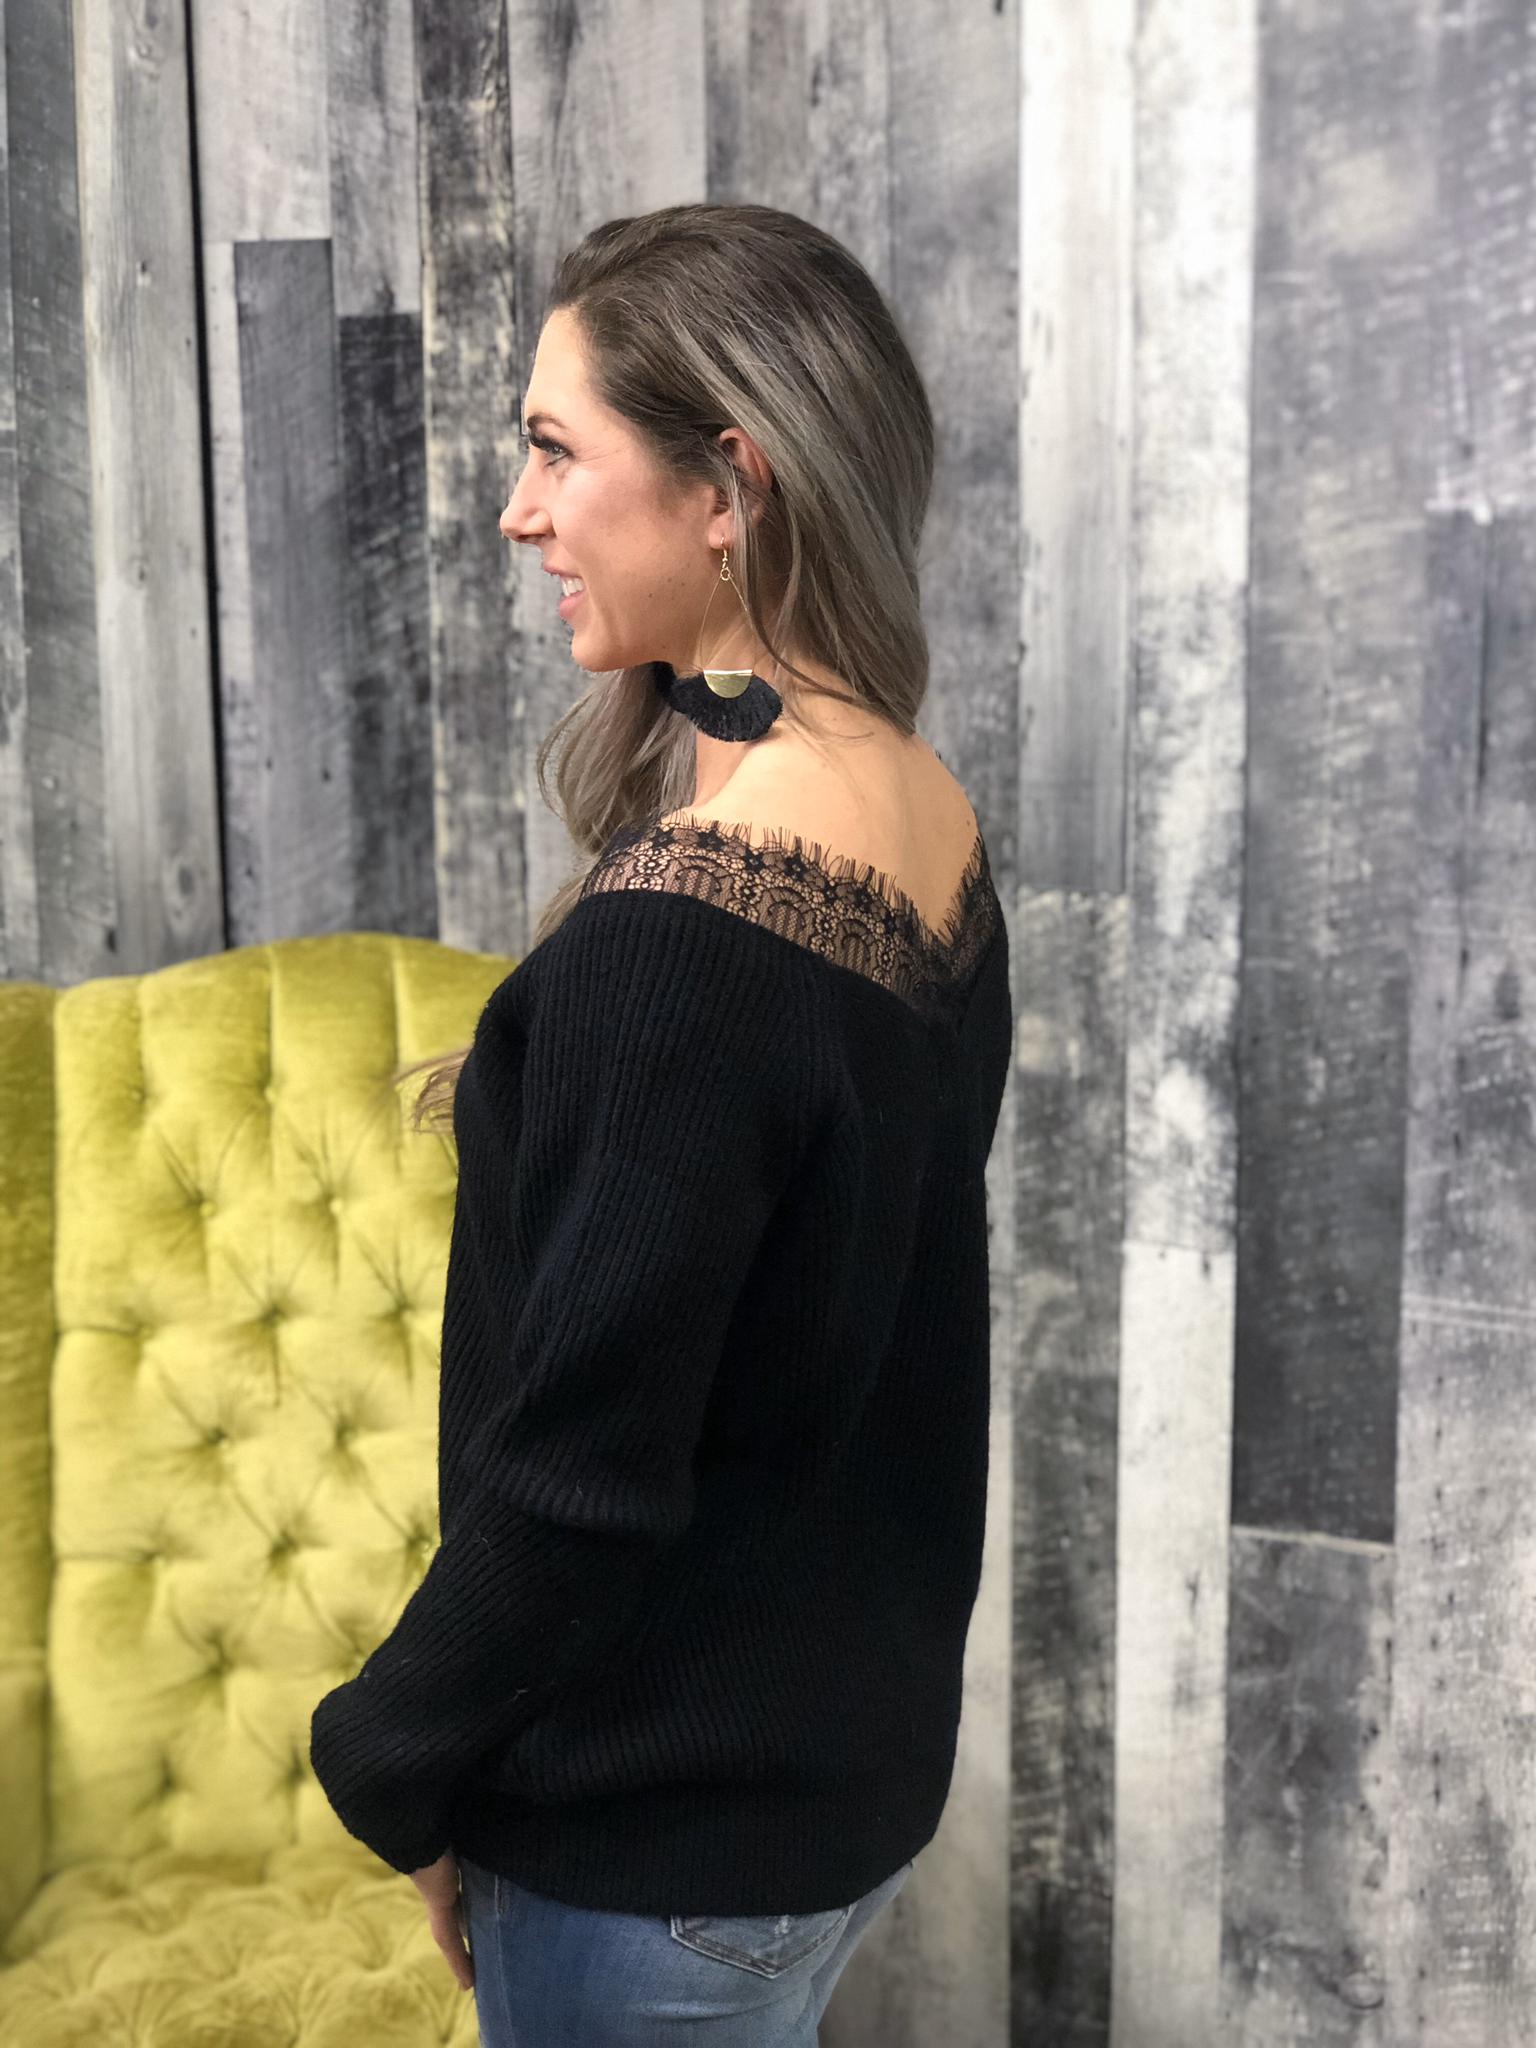 Lace black sweater